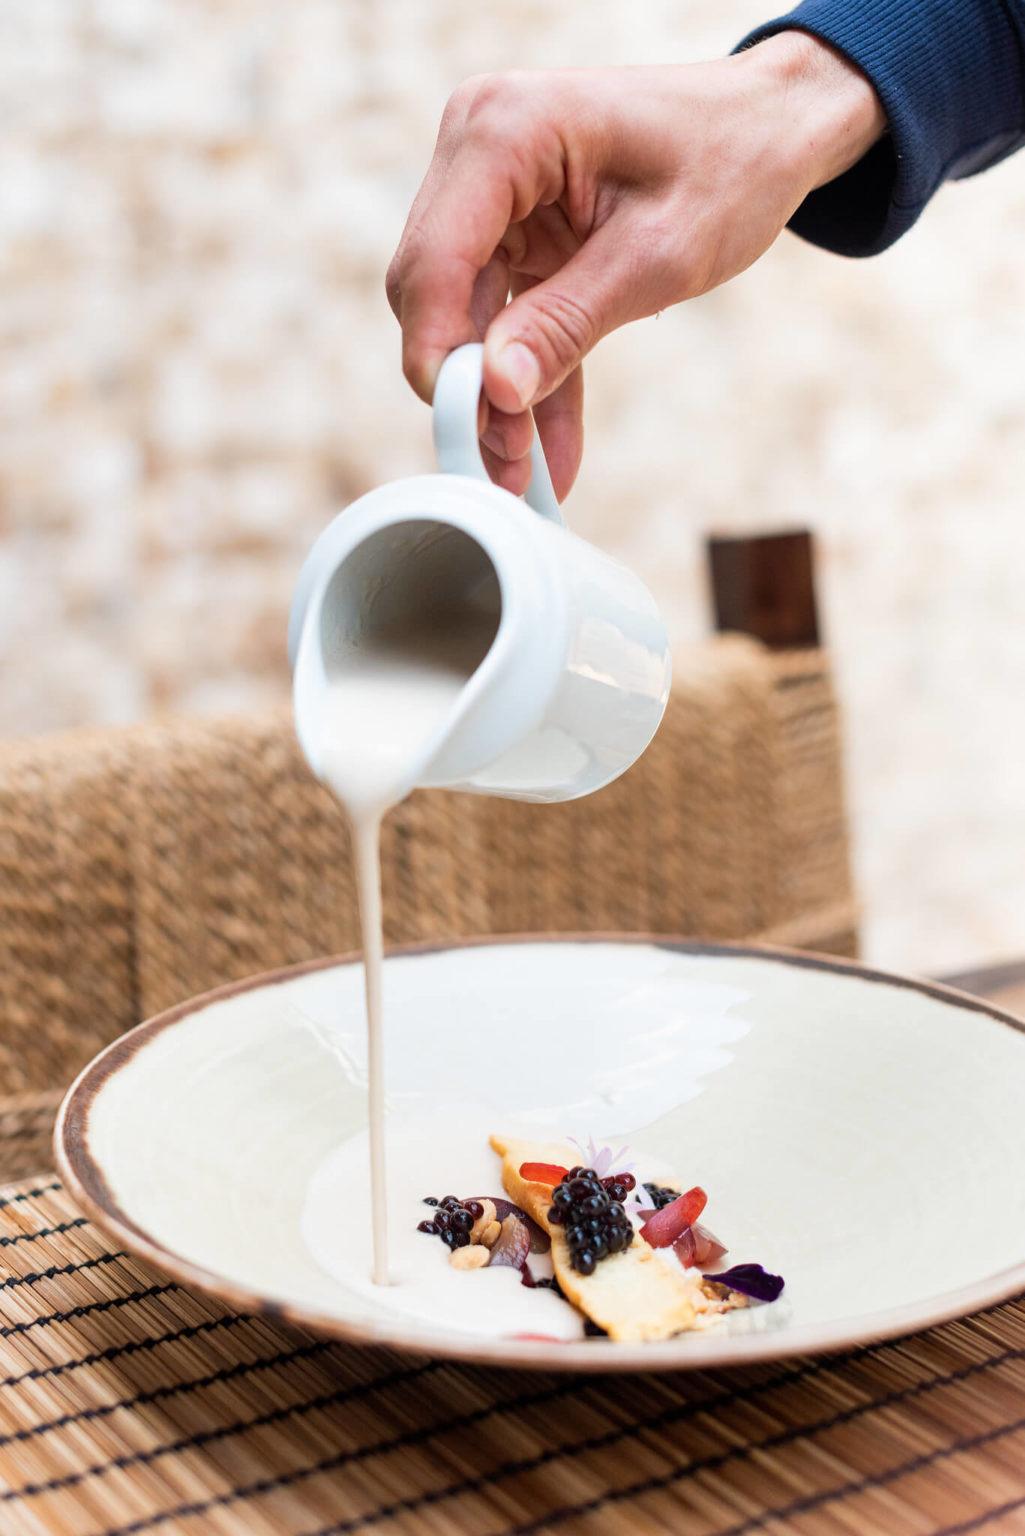 https://www.white-ibiza.com/wp-content/uploads/2020/03/ibiza-restaurants-the-giri-cafe-2020-04-1025x1536.jpg